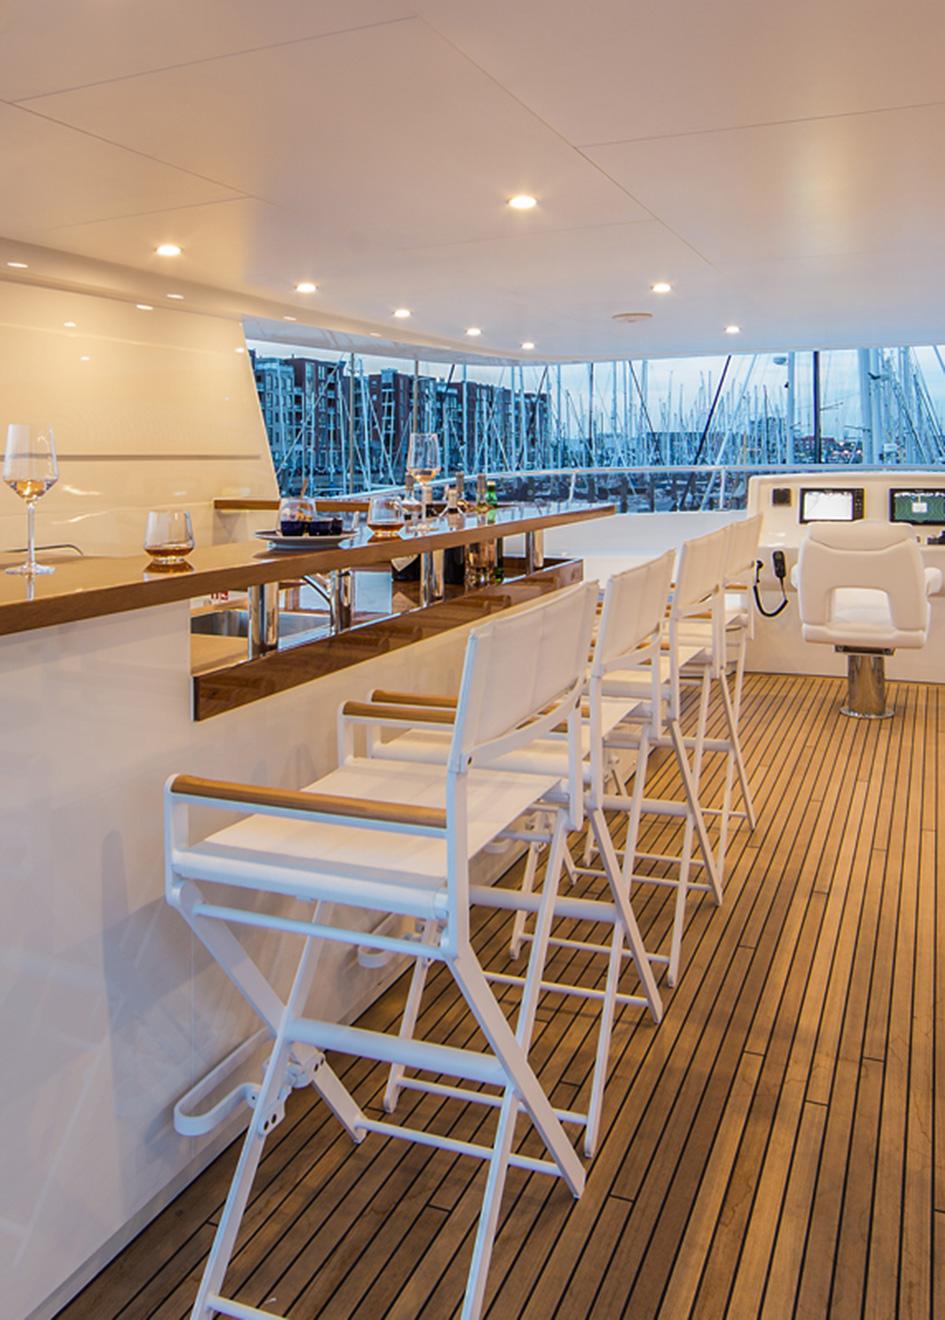 the-upper-deck-of-the-van-der-valk-explorer-yacht-dutch-falcon